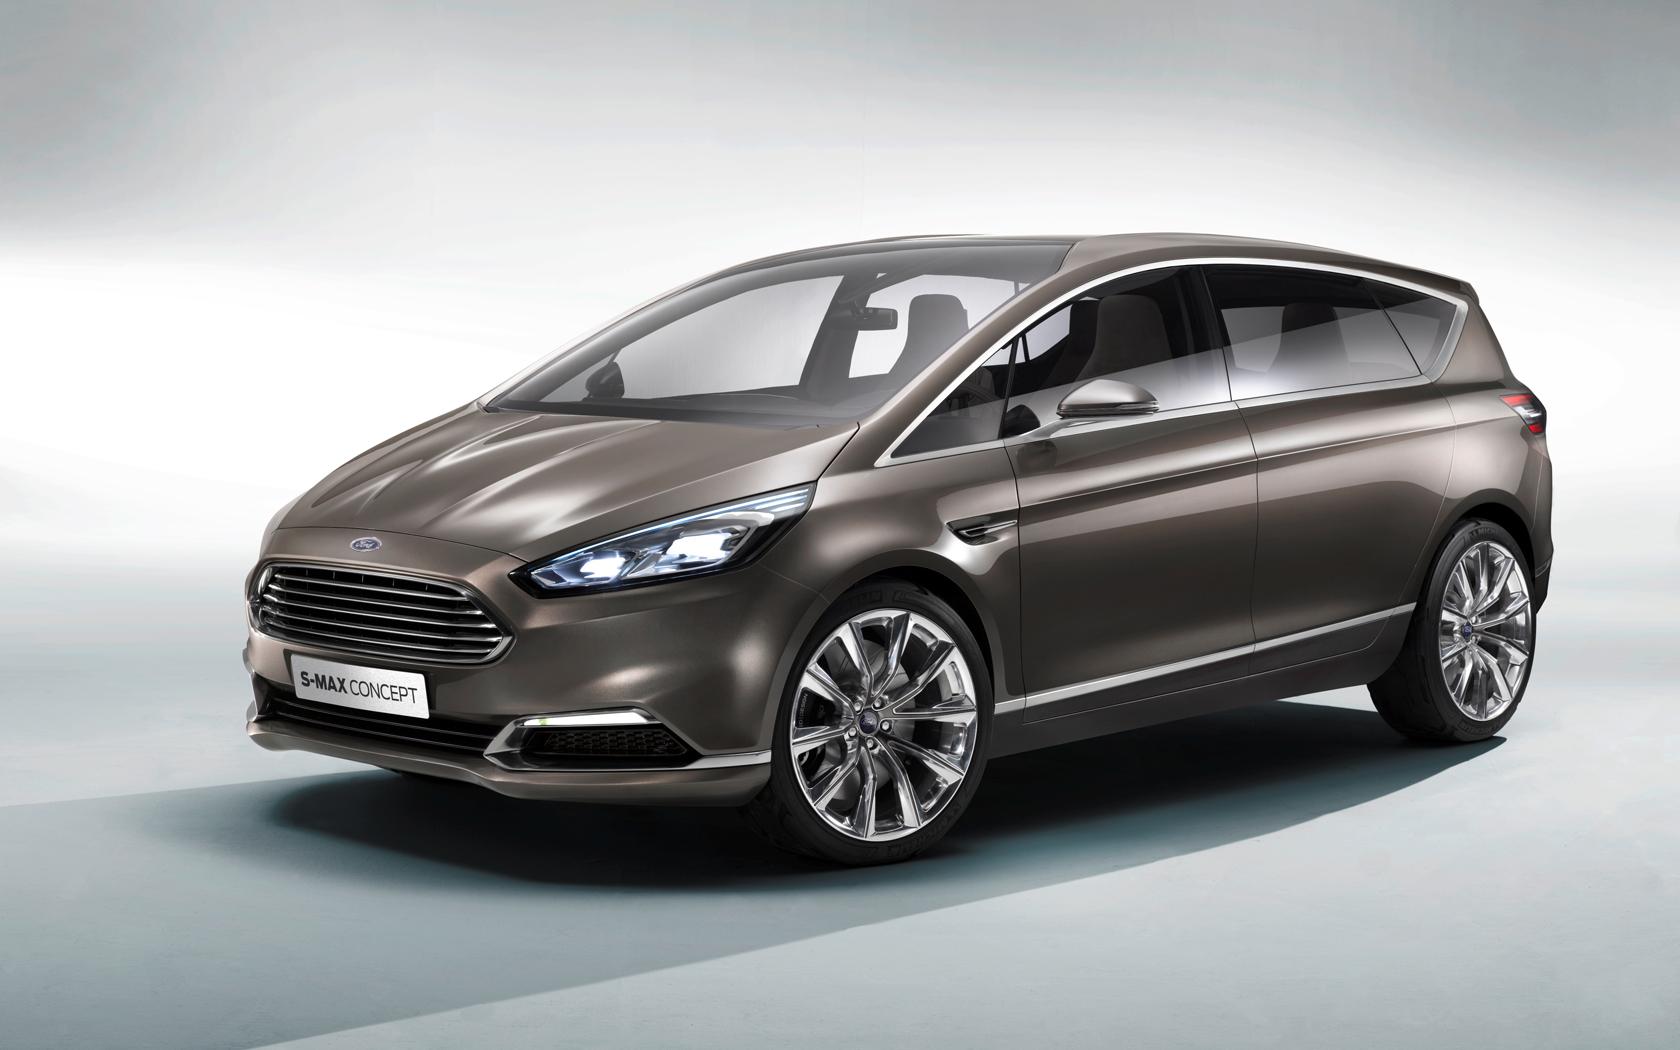 Ford-S-MAX-Concept-02